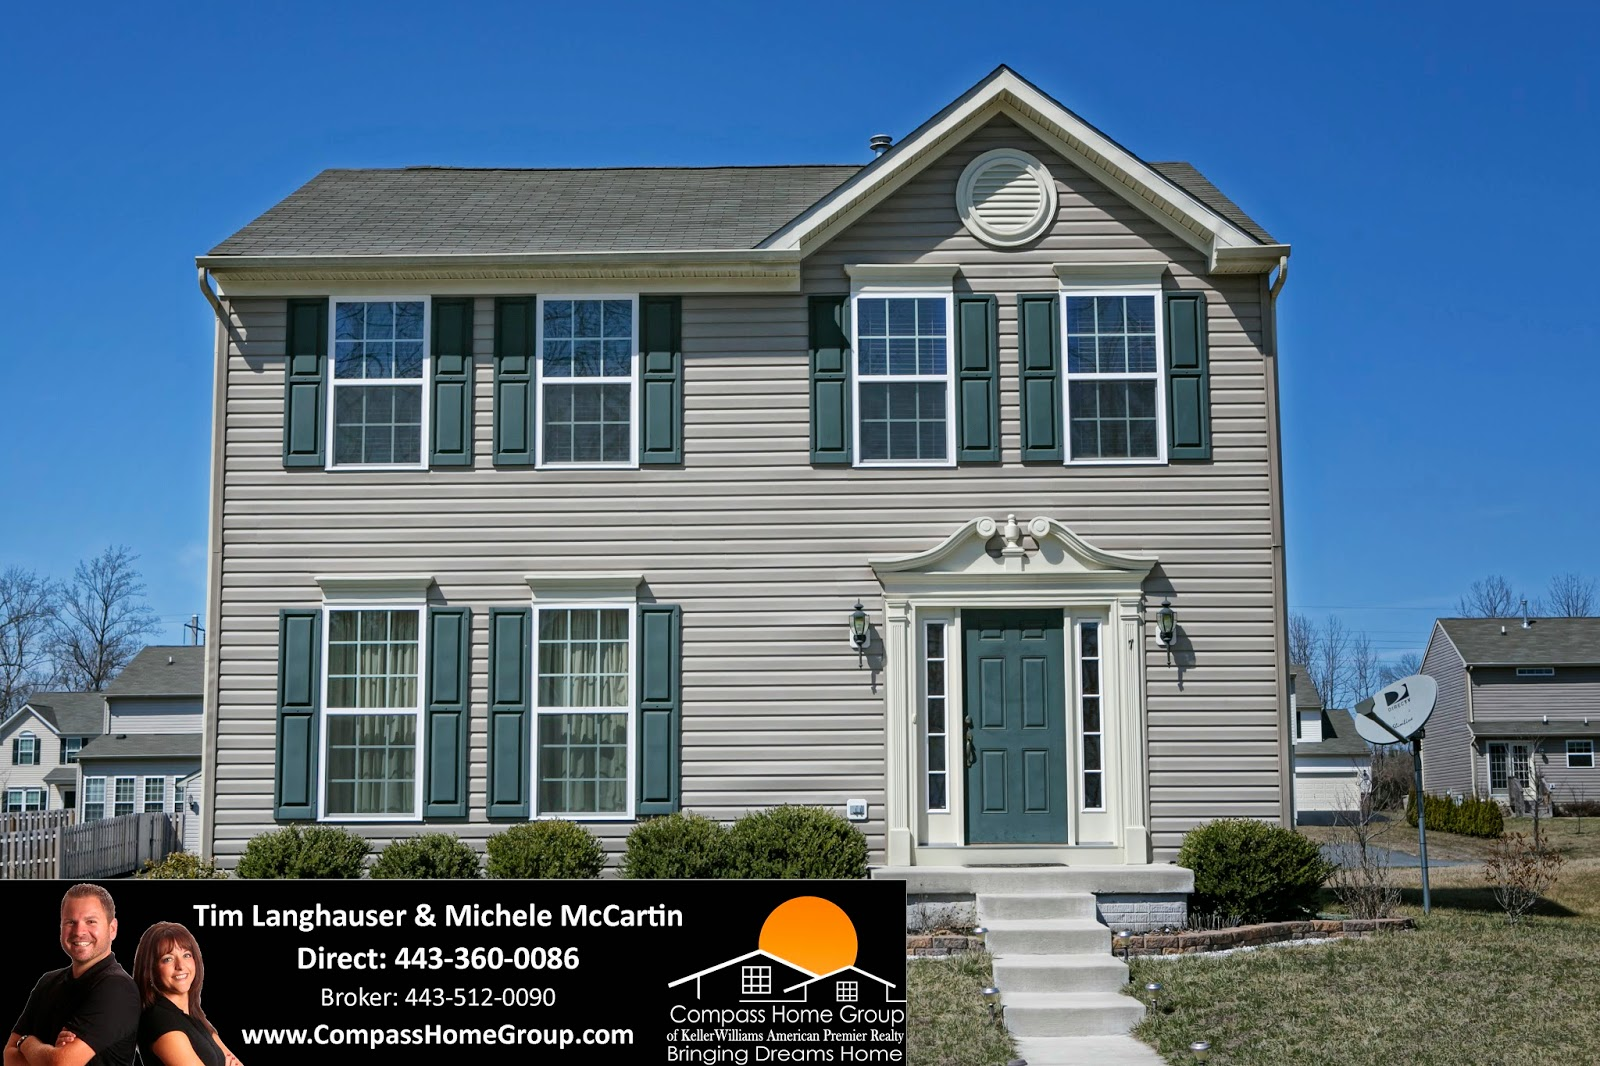 http://www.buy-sellmdhomes.com/listing/mlsid/161/propertyid/CC8307009/